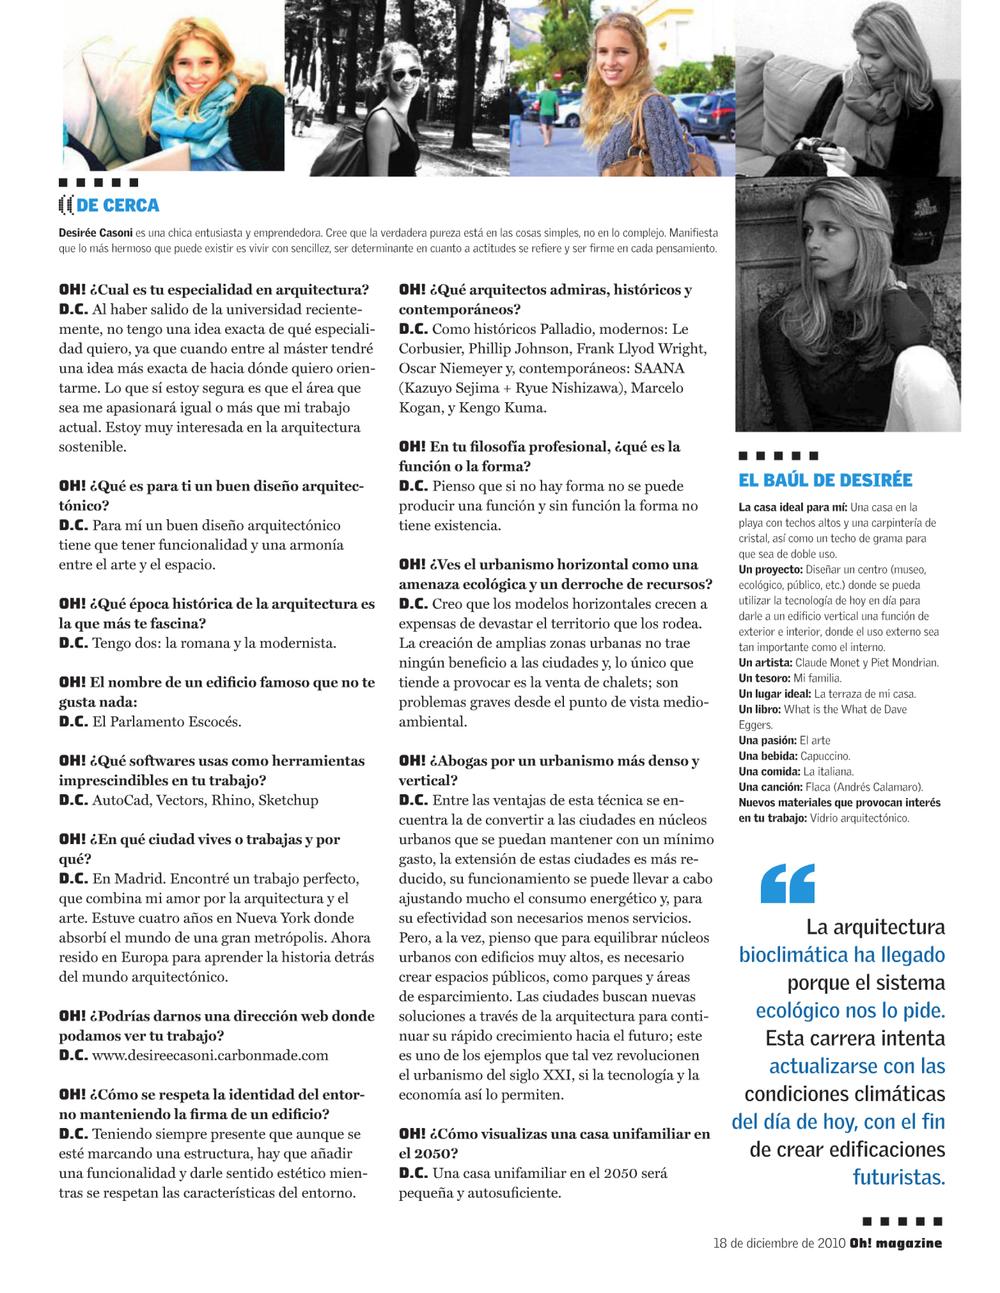 Oh! Magazine - listindiario sept2.jpg